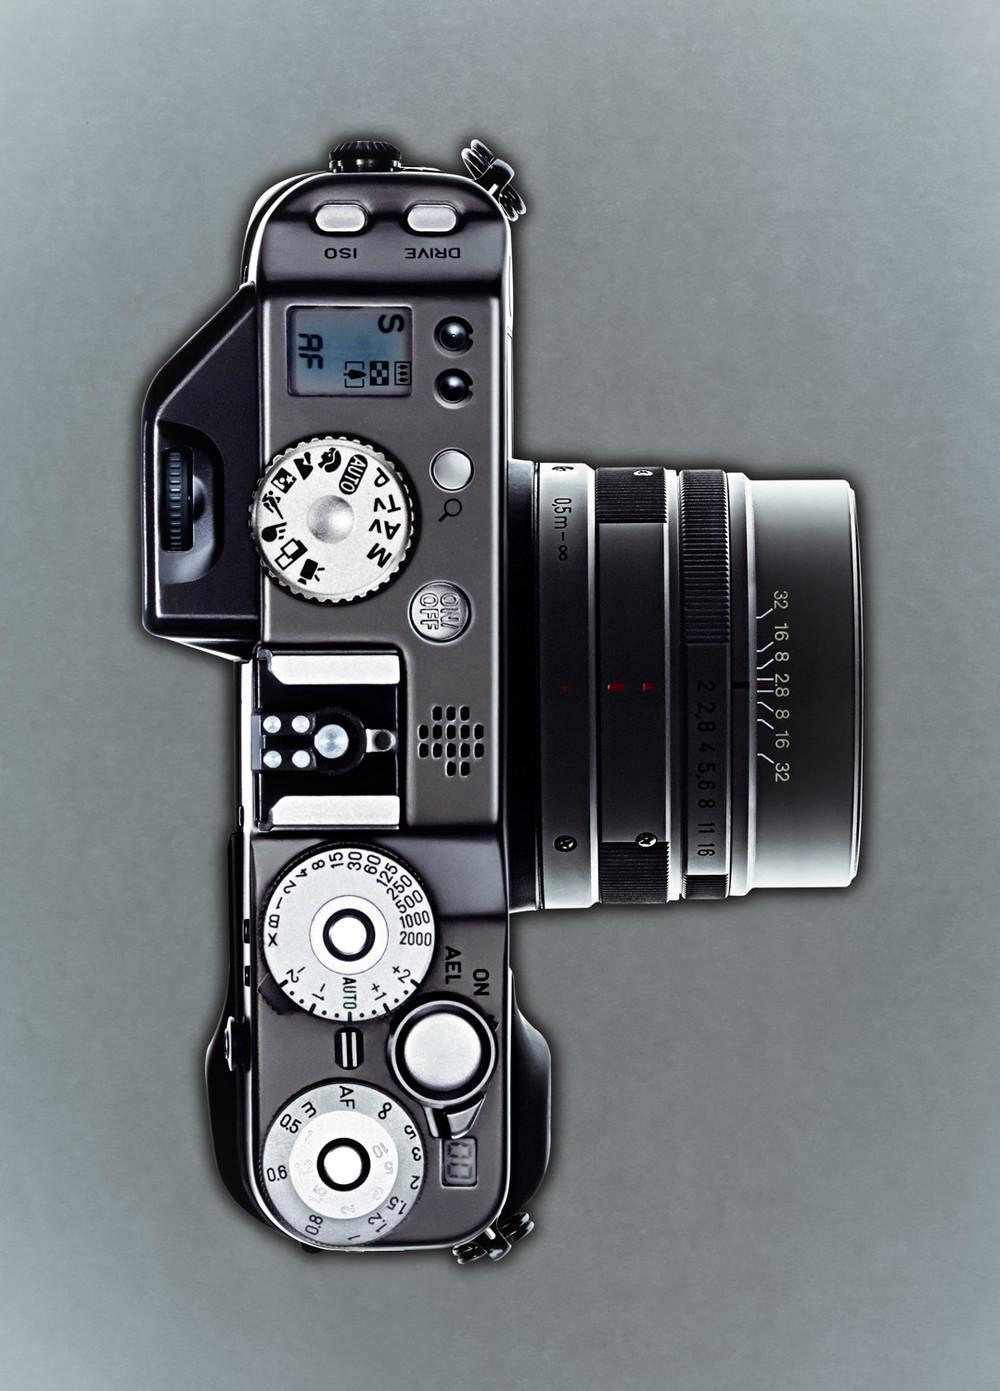 Camera above